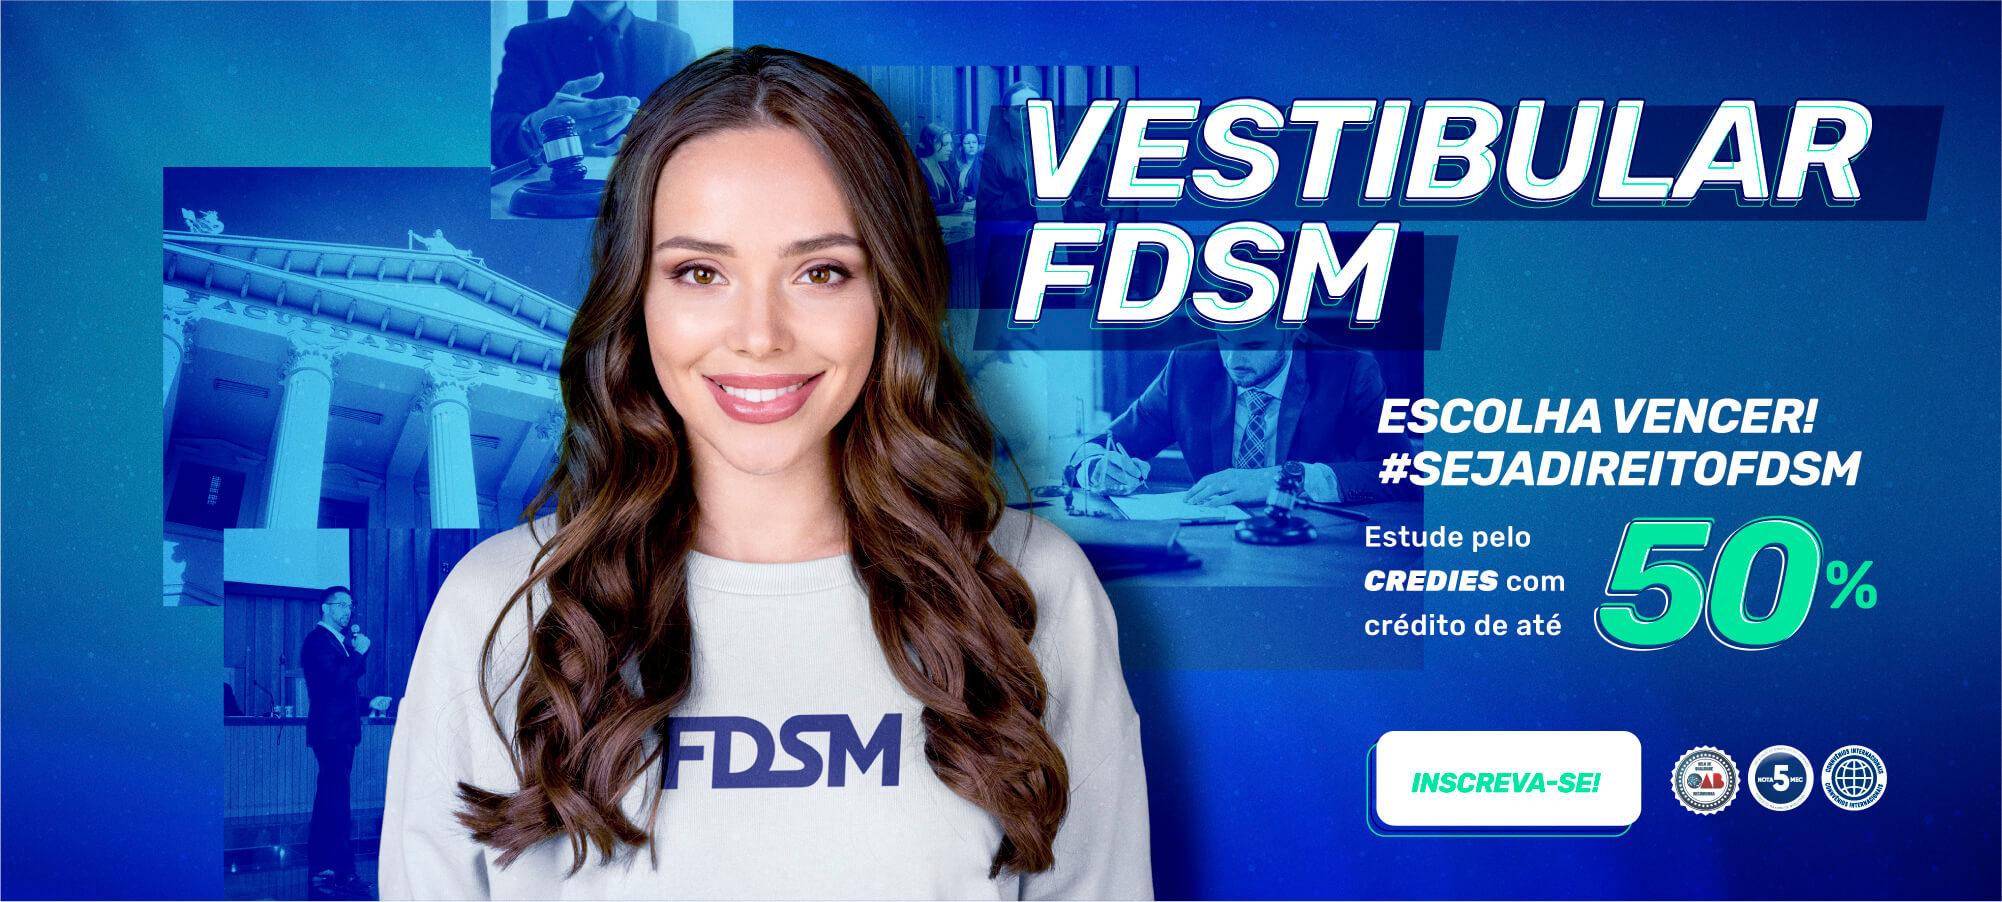 Vestibular FDSM 2021